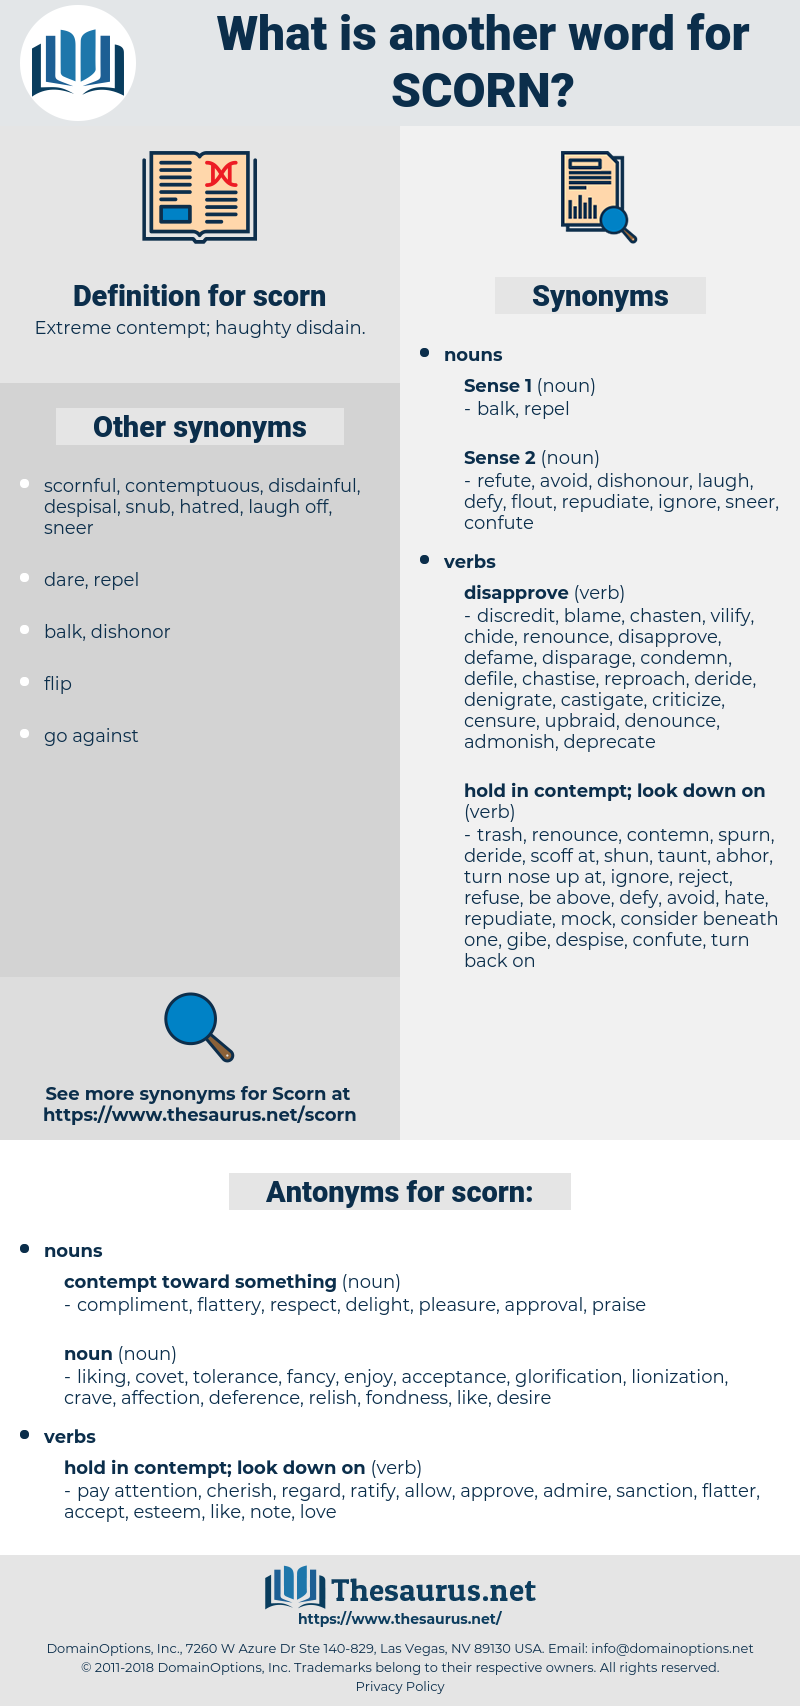 scorn, synonym scorn, another word for scorn, words like scorn, thesaurus scorn